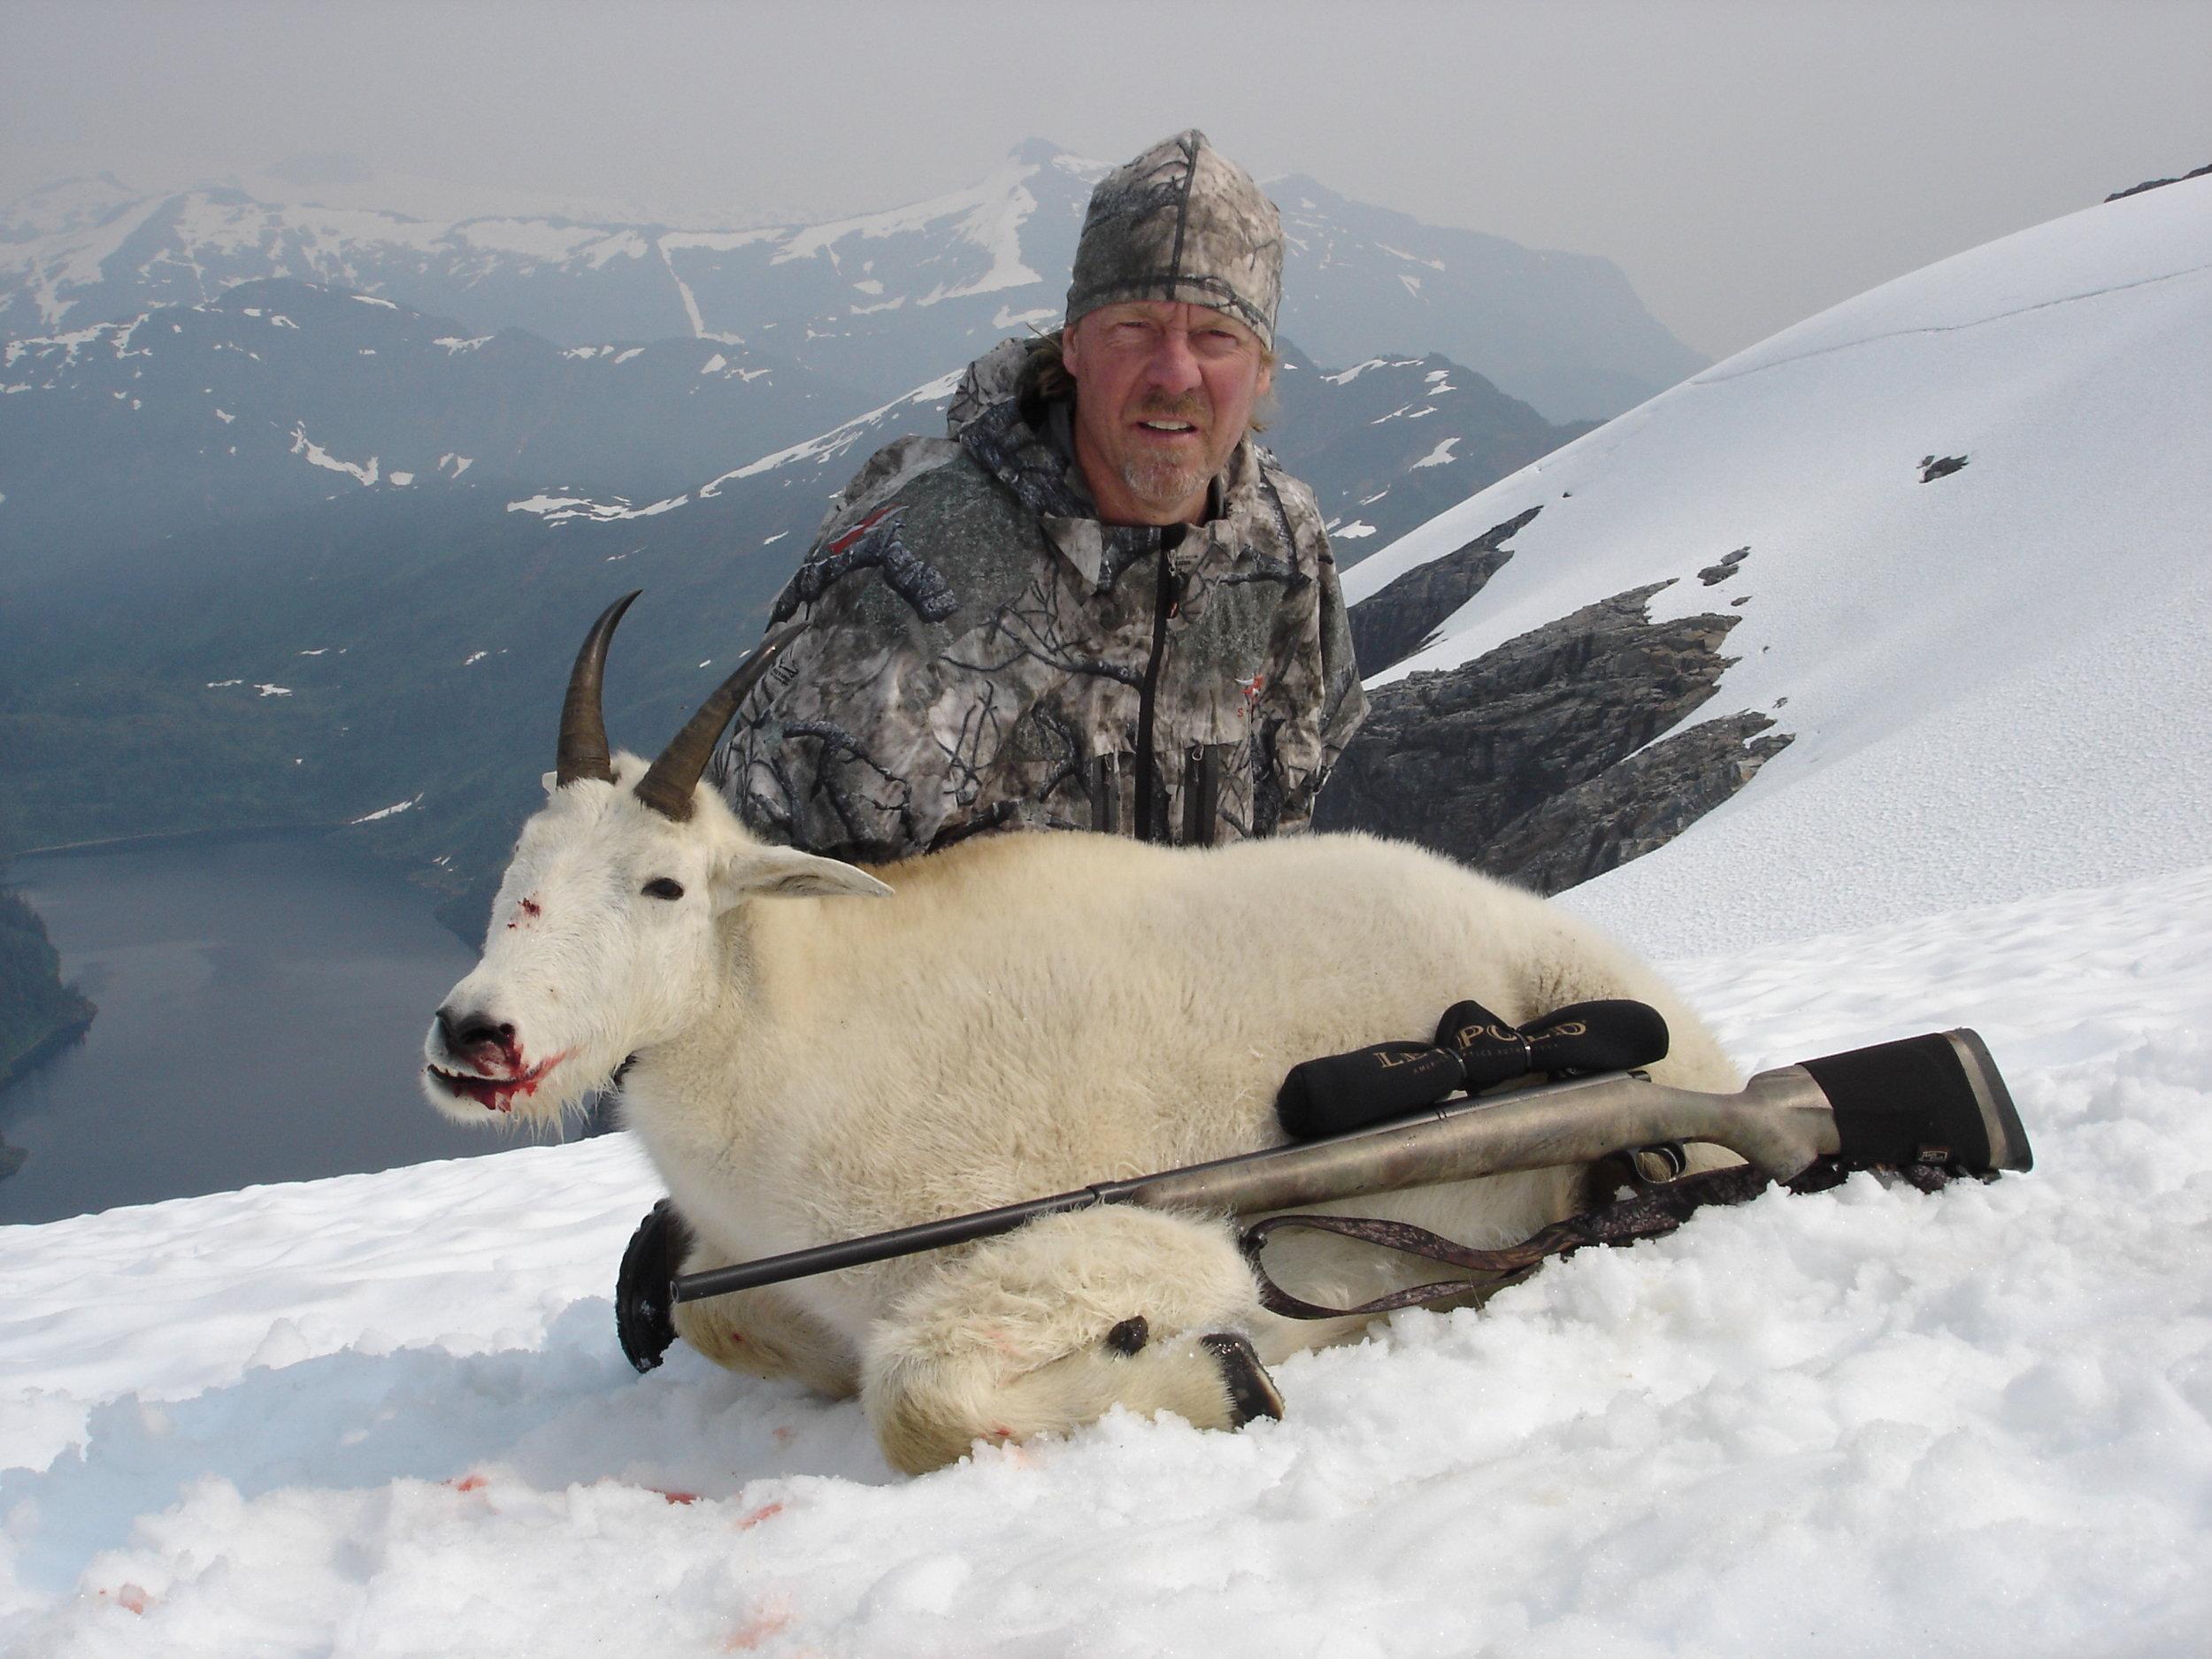 Bob Olson Goat 09 004.jpg